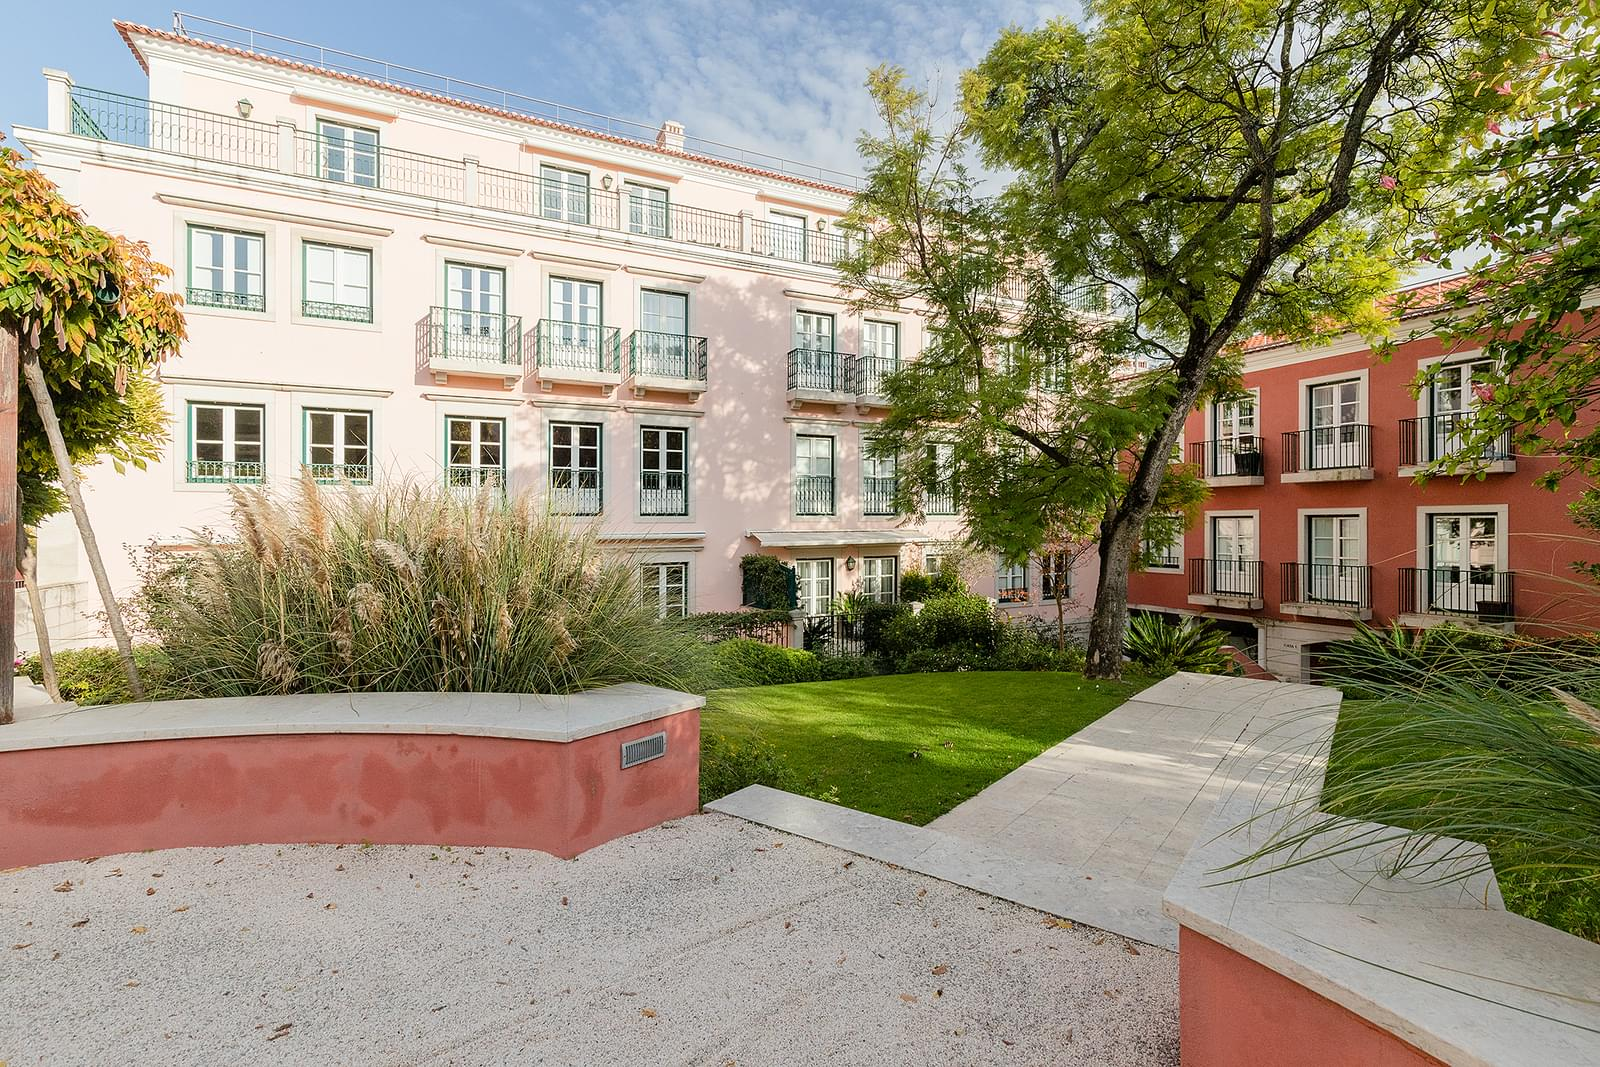 pf18618-apartamento-t4-1-lisboa-e5fd87e5-d20a-4fc7-b8b4-14fa664725d3